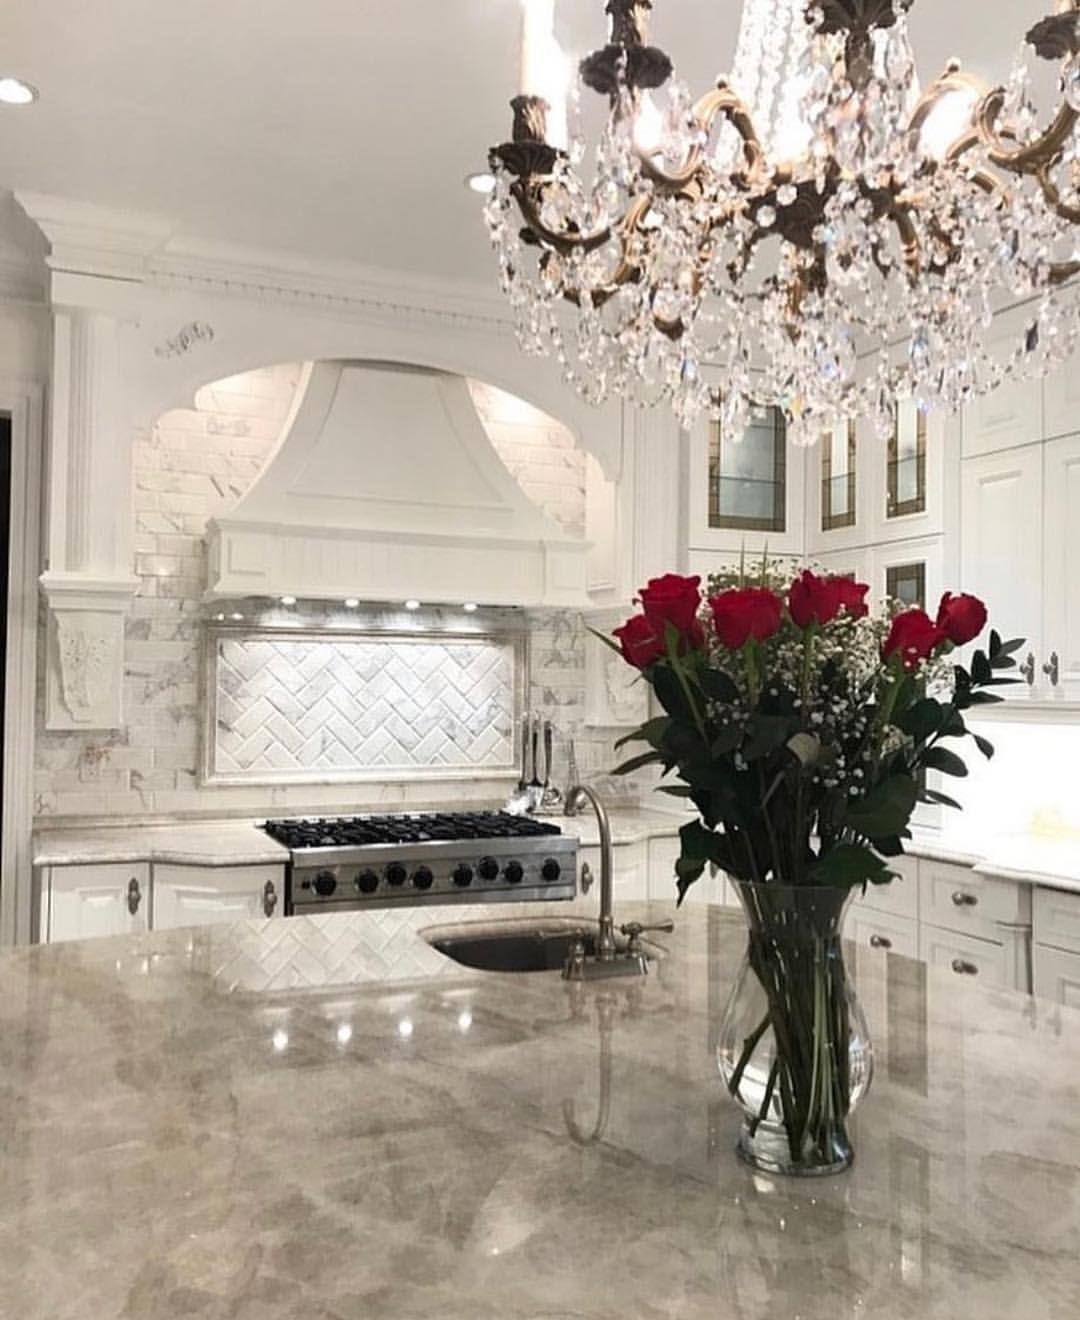   Kitchen crush!✨..by @rai_marble ..✨what do you guys think?????  . . . . . . . . . . #interiordesign #interiordecor #homedecor… #kitchencrushes